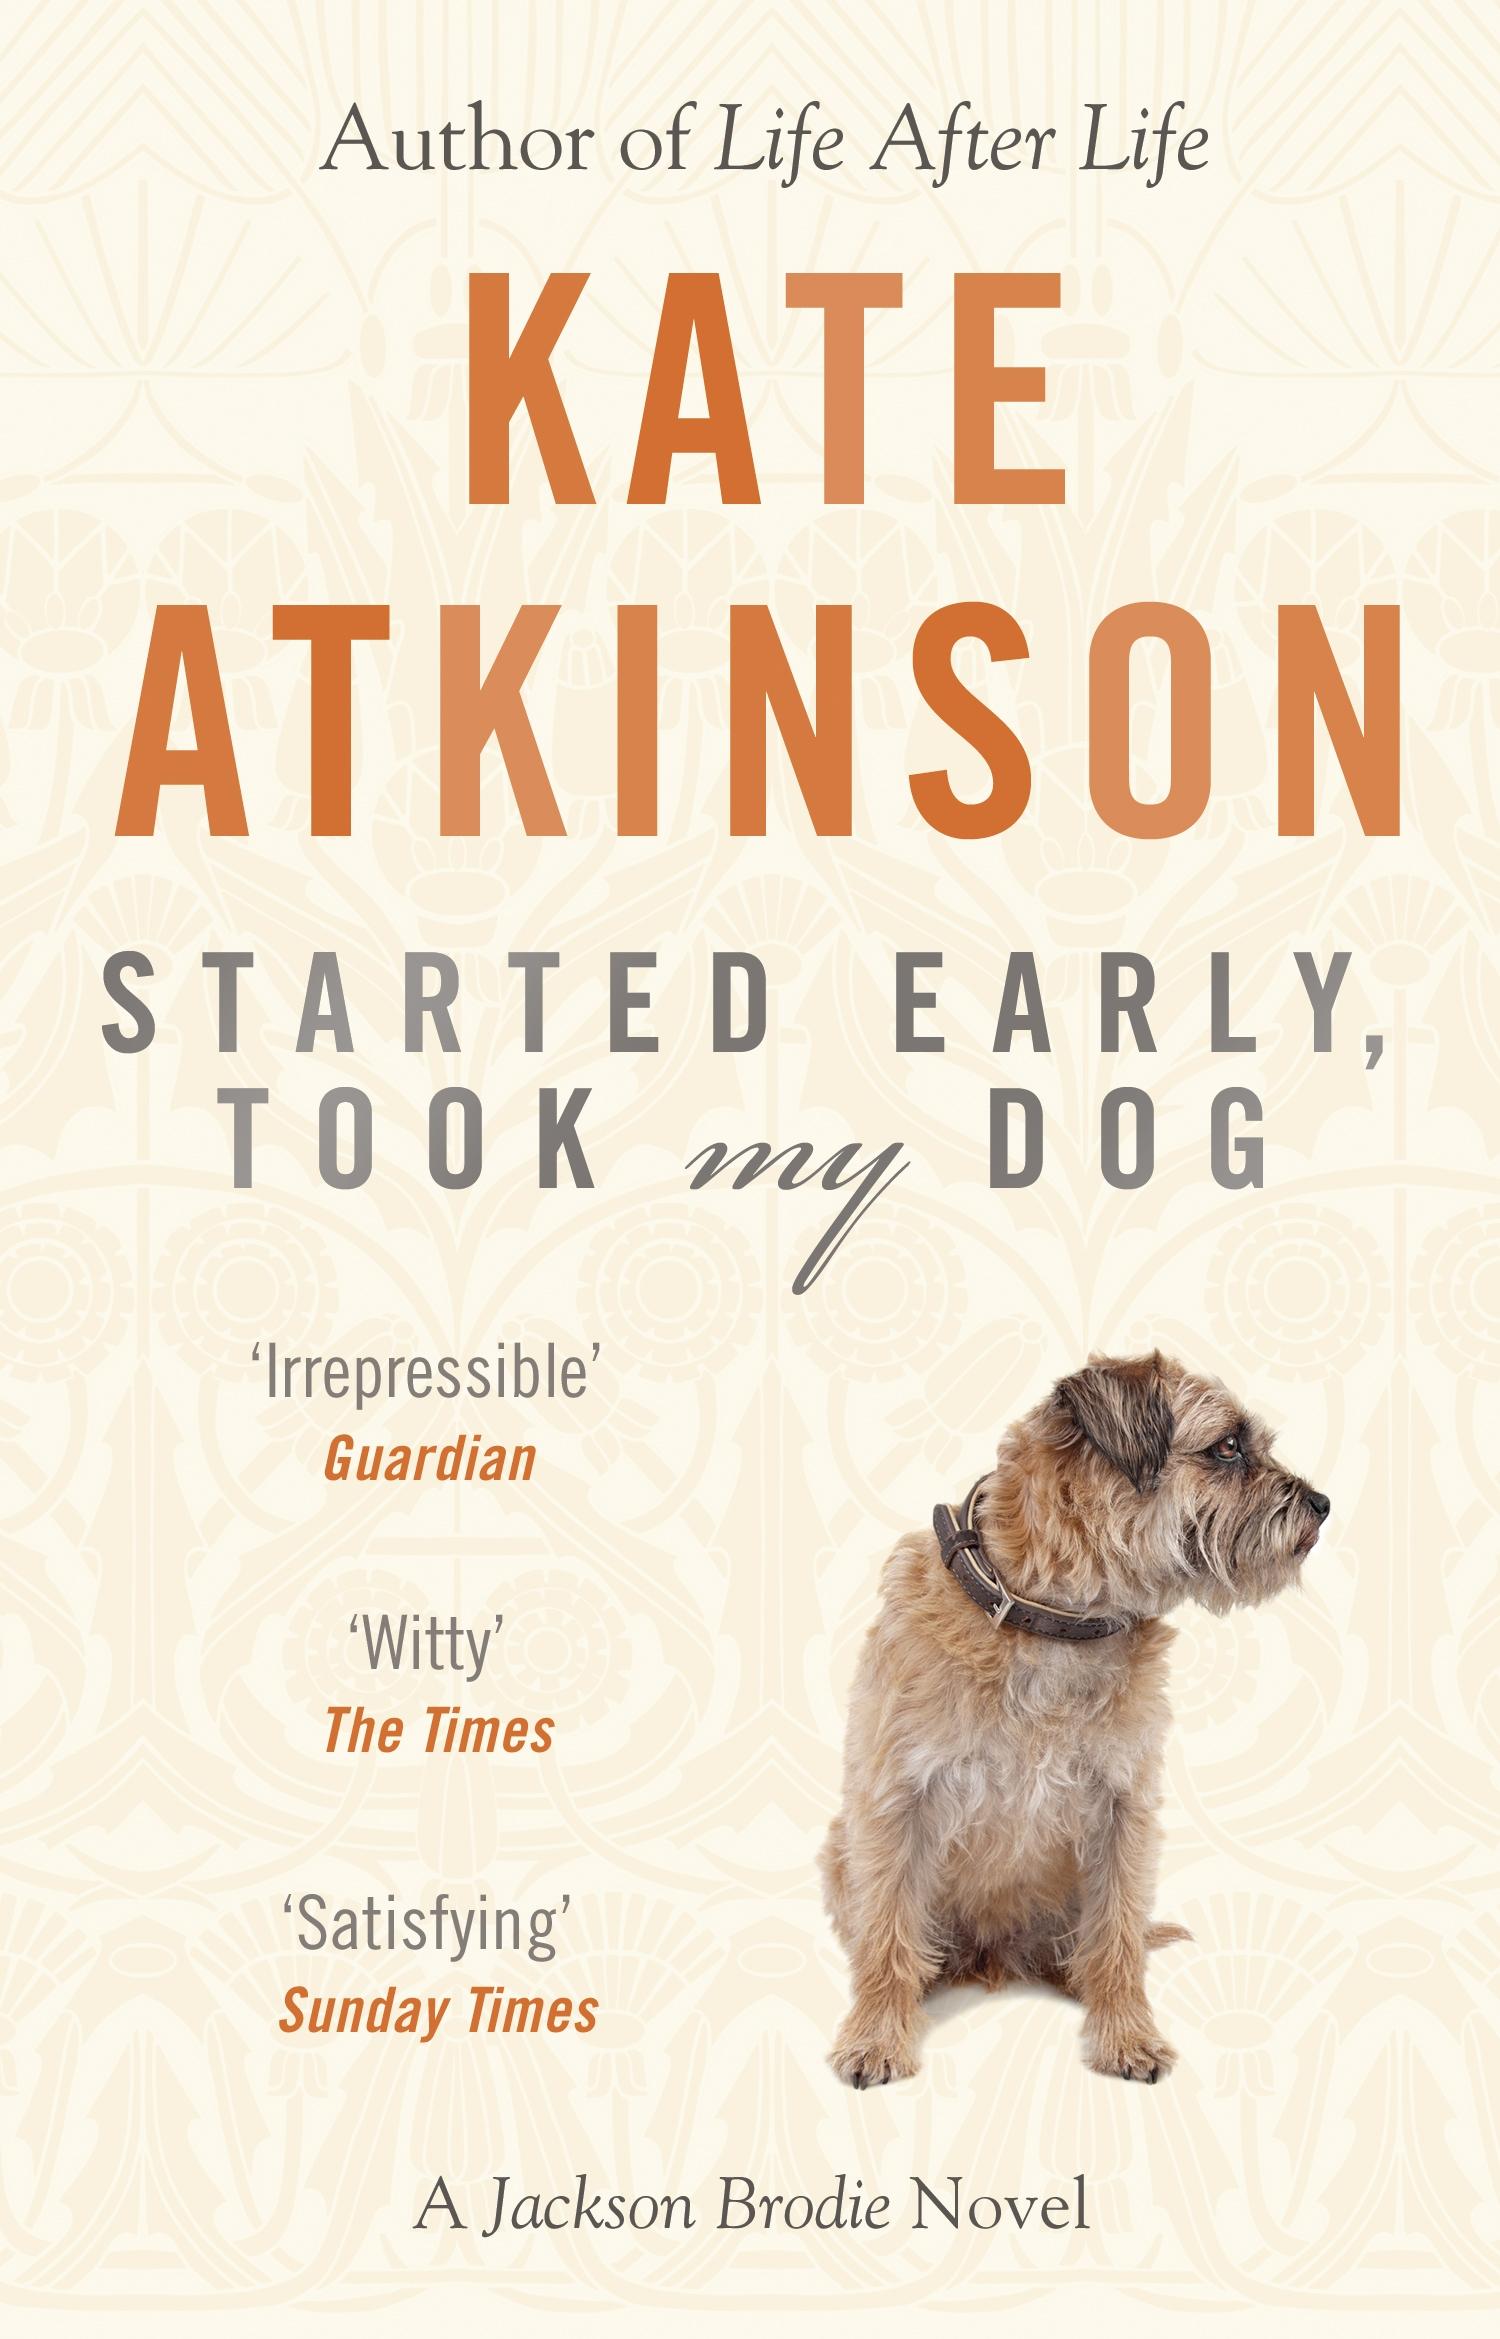 tracy waterhouse kate atkinson